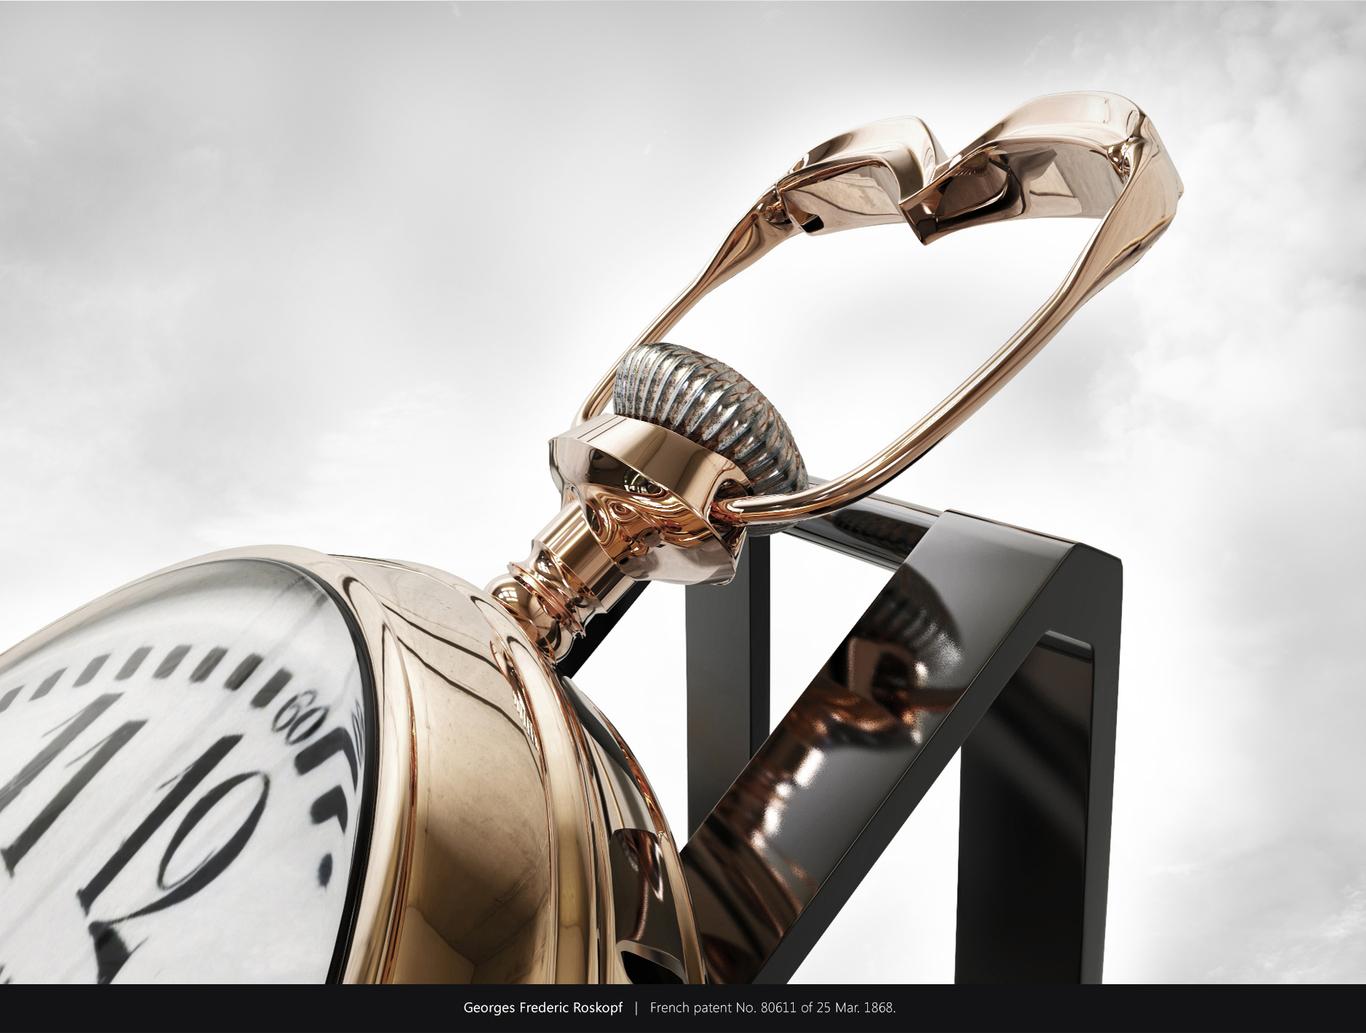 Kromaion roskopf pocket watch 1 b029e1a0 vppi